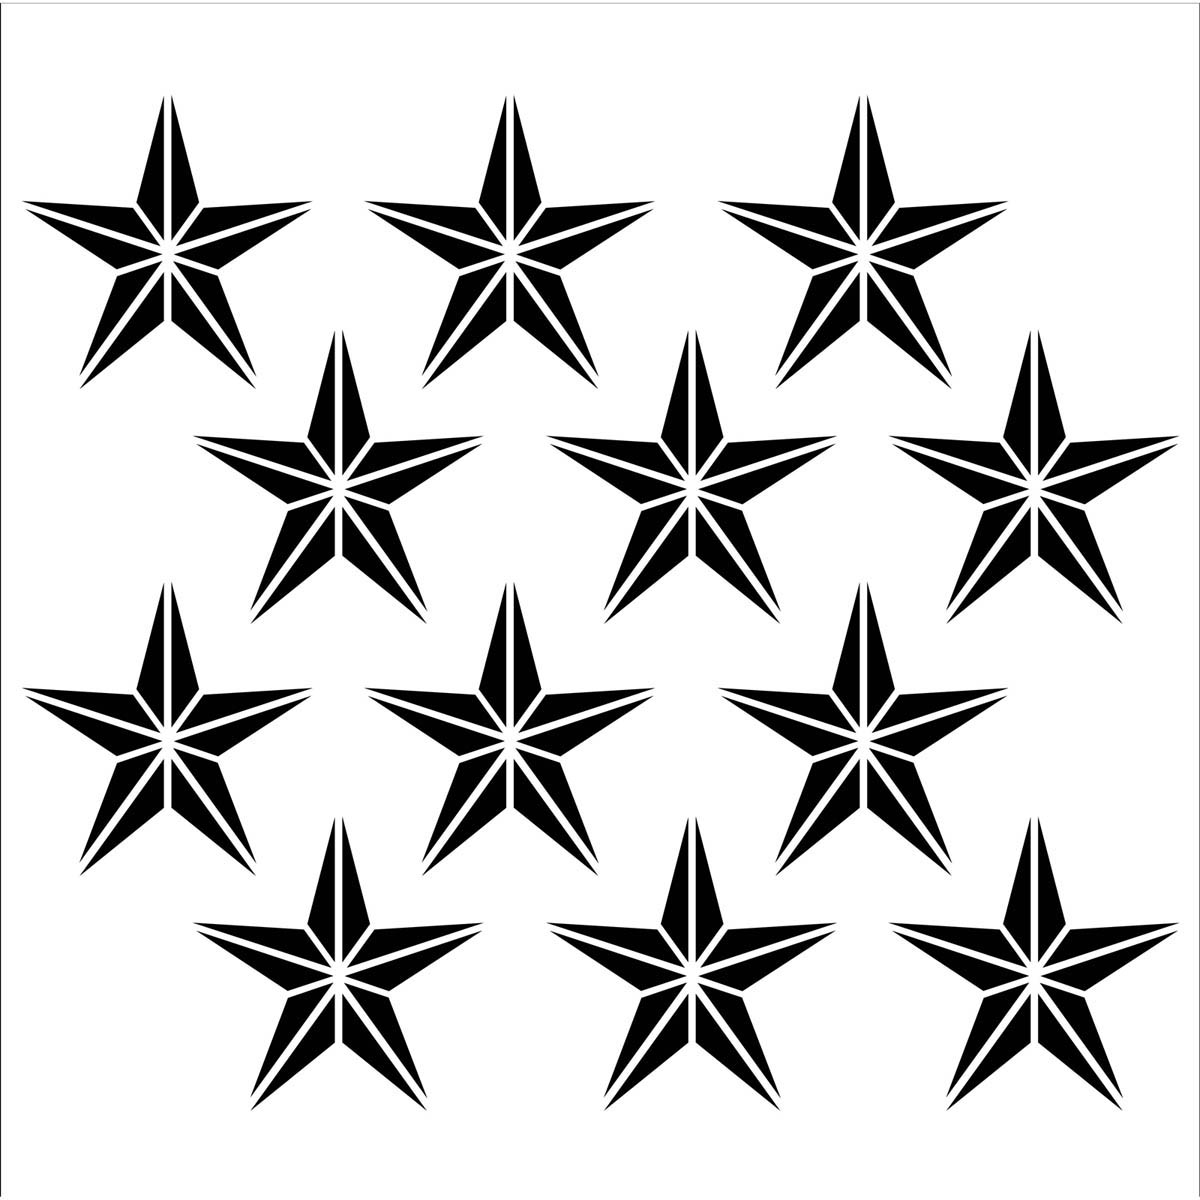 FolkArt ® Painting Stencils - Large - Stars Forever - 31599